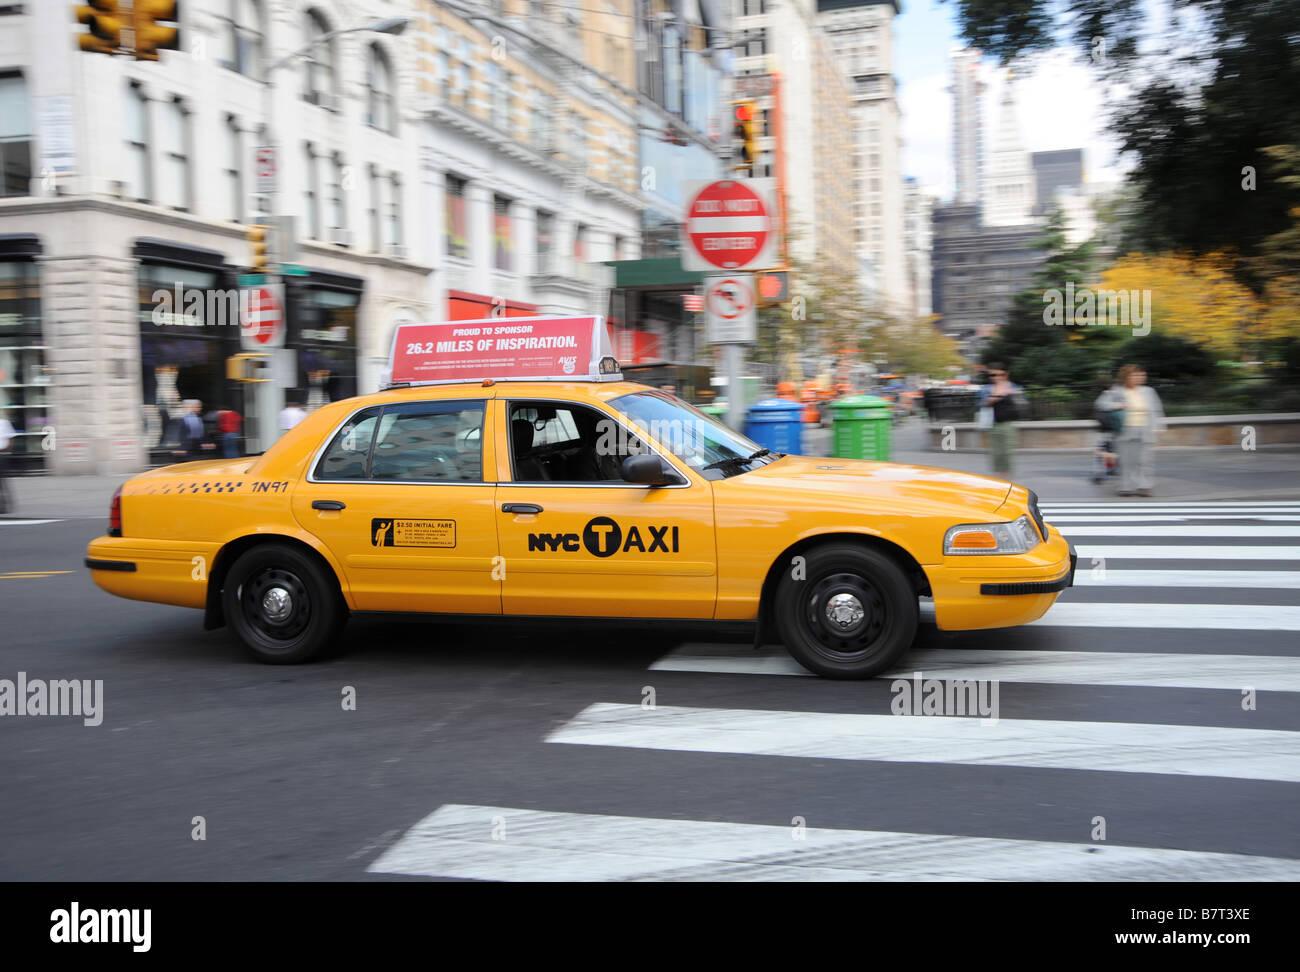 New york tax stock options